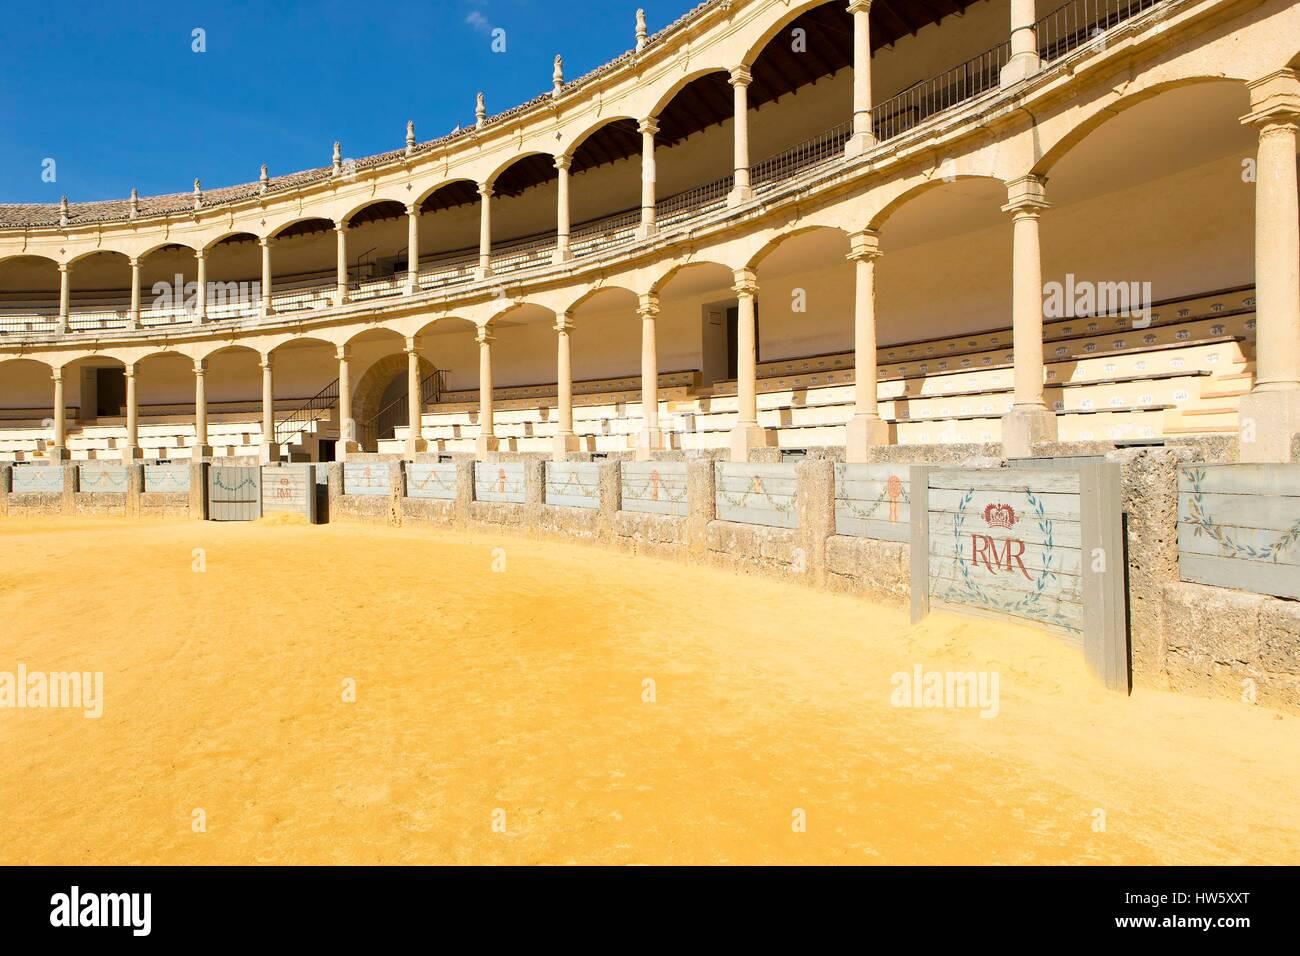 Spain, Andalucia, Malaga Province, Ronda, bull ring Plaza de Toros de la Real Maestraza de Caballeria - Stock Image